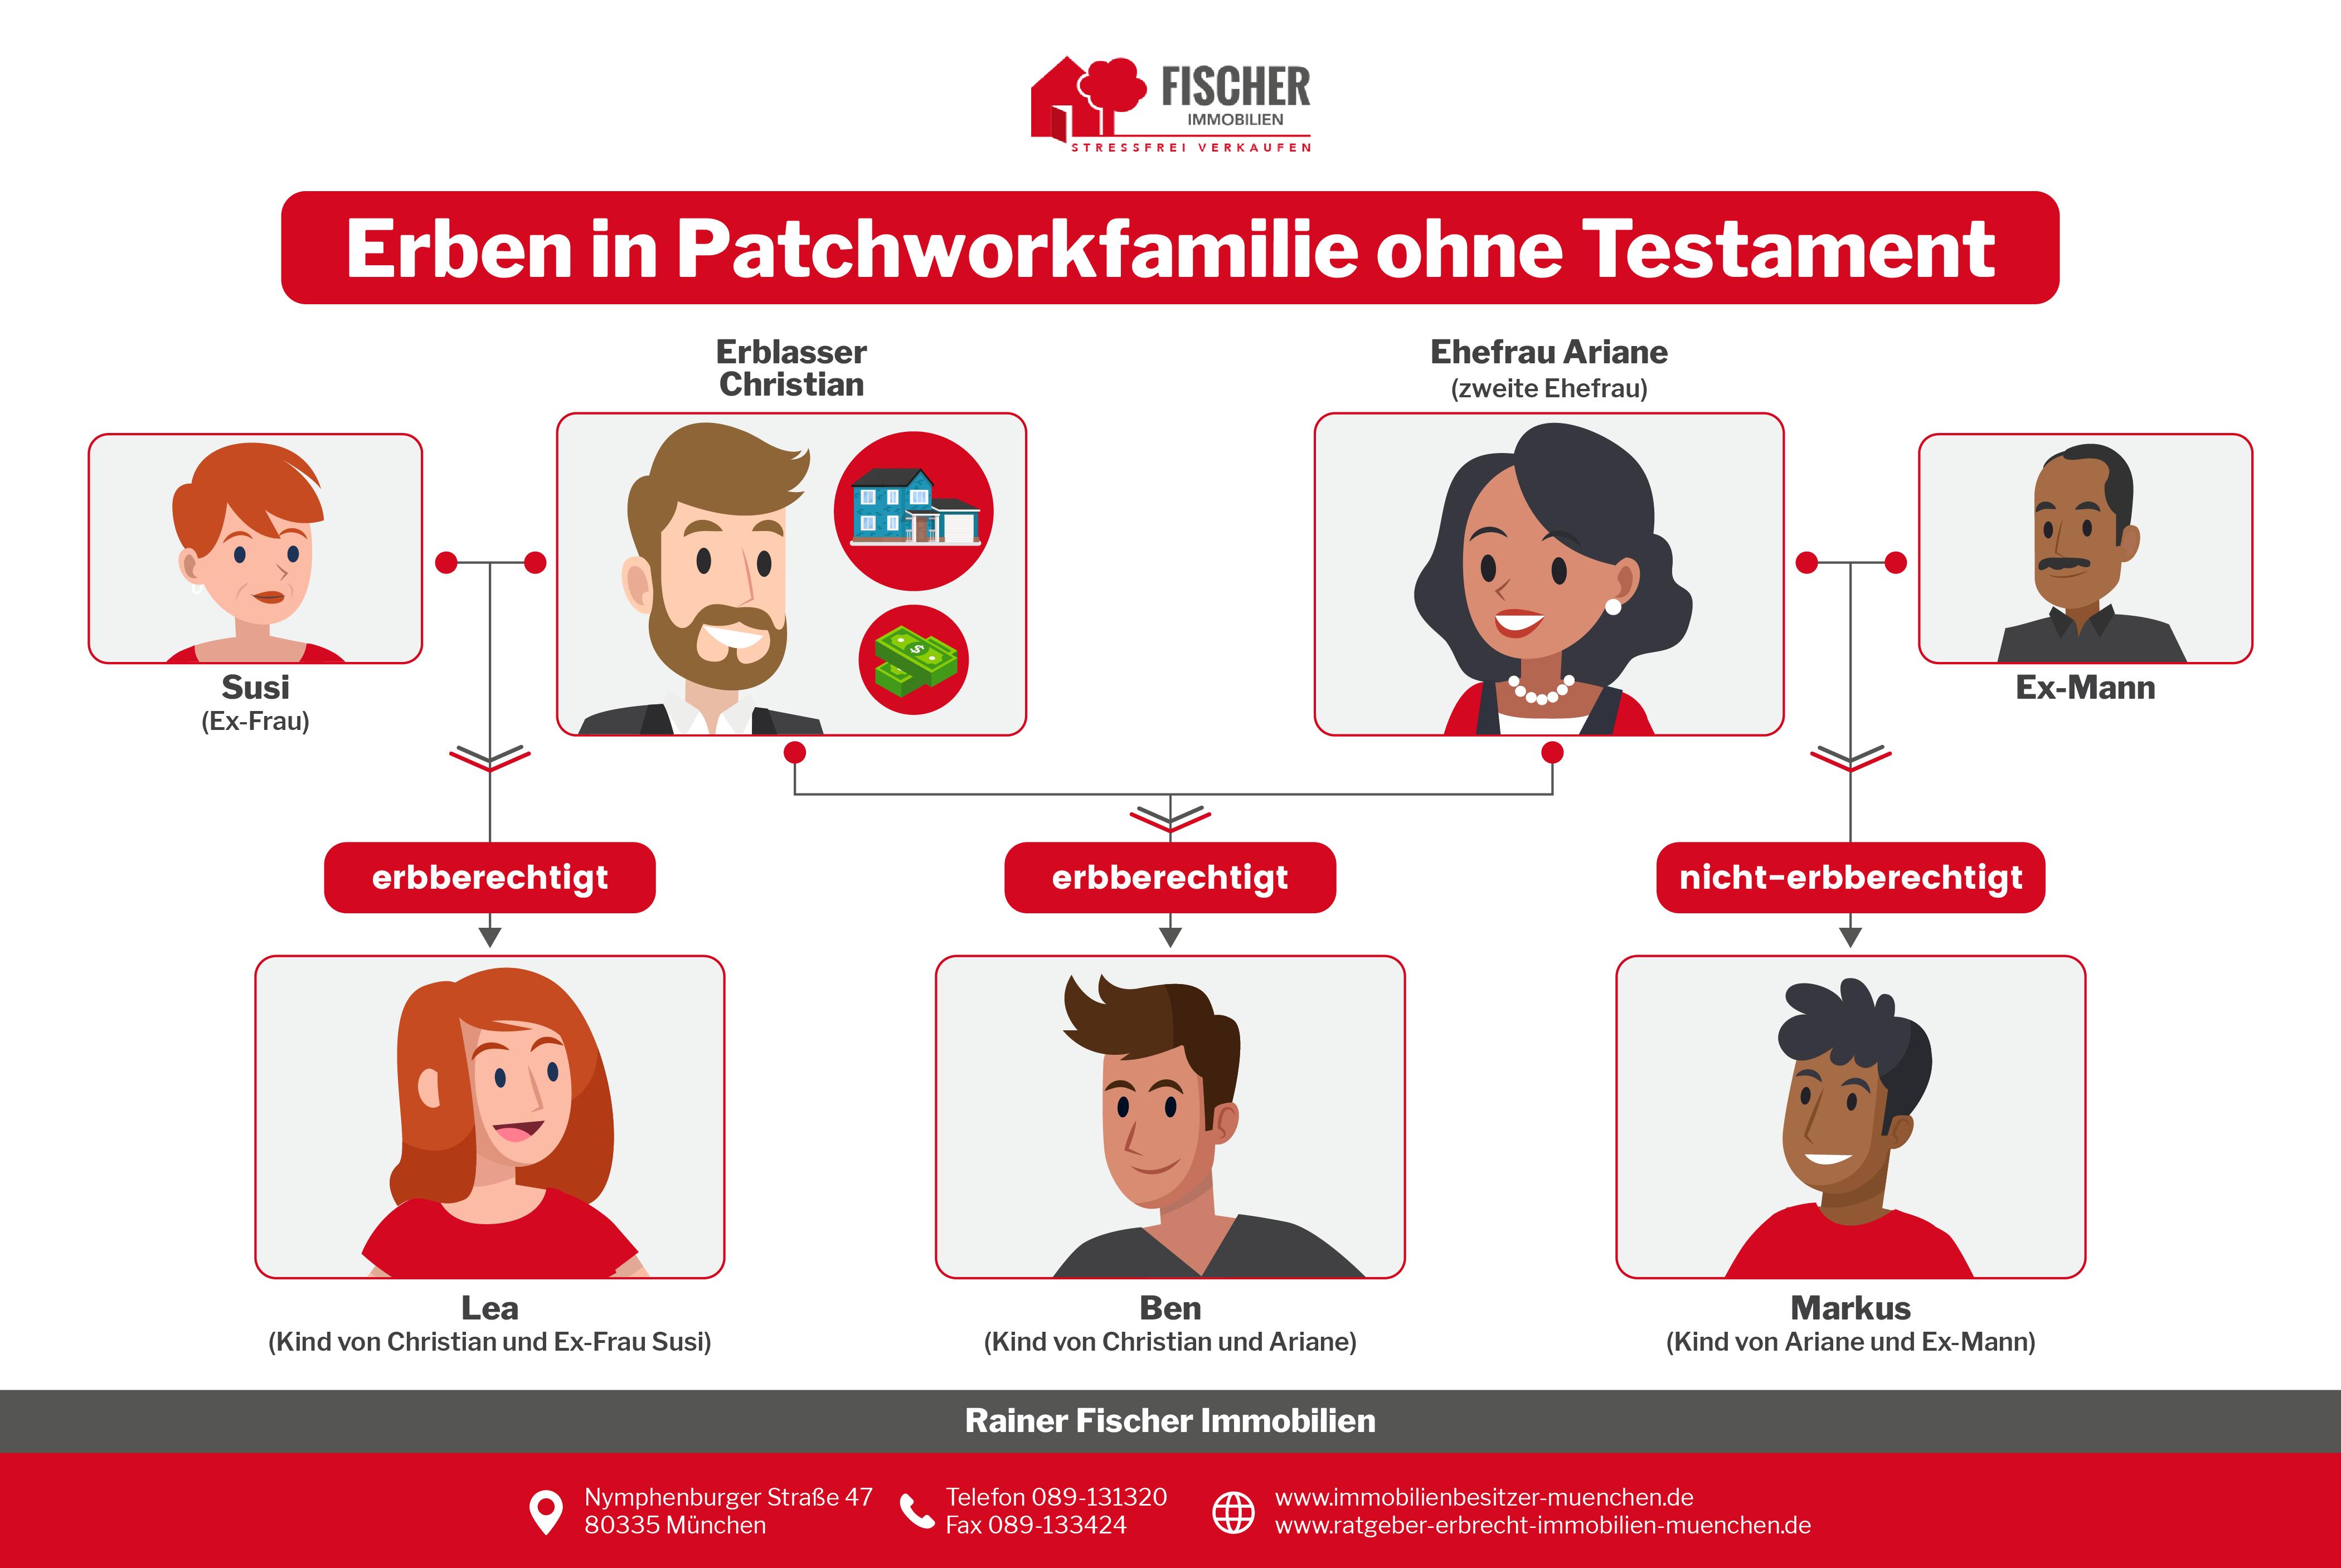 Erbrecht Infografik - Erben in Patchworkfamilie ohne Testament